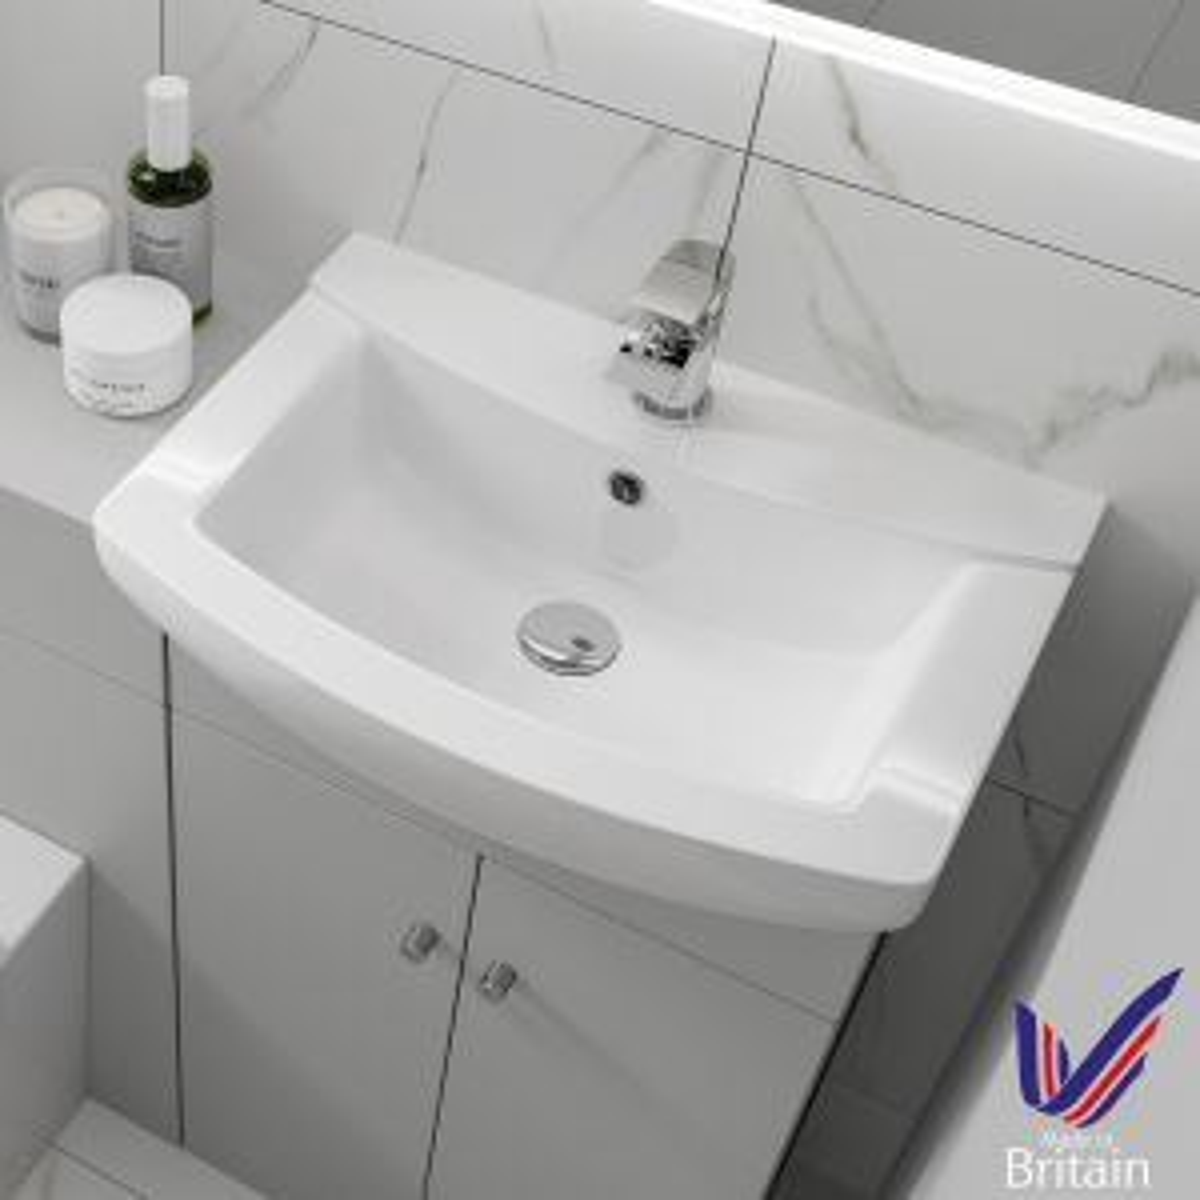 Ikoma White Gloss Vanity Unit with Basin 450mm Basin